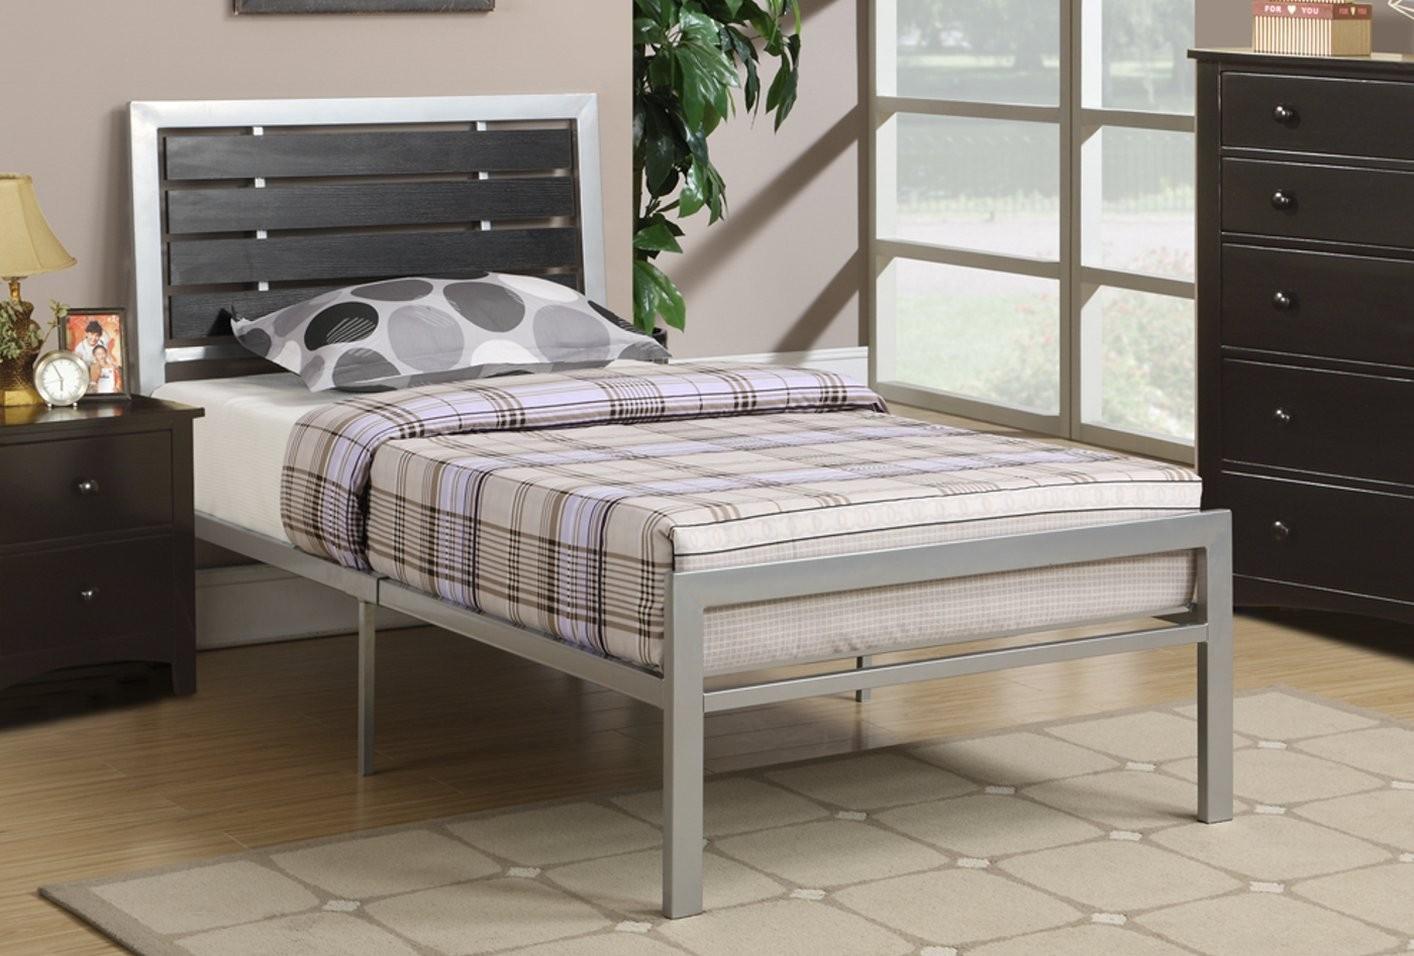 Landon Twin Bed frame